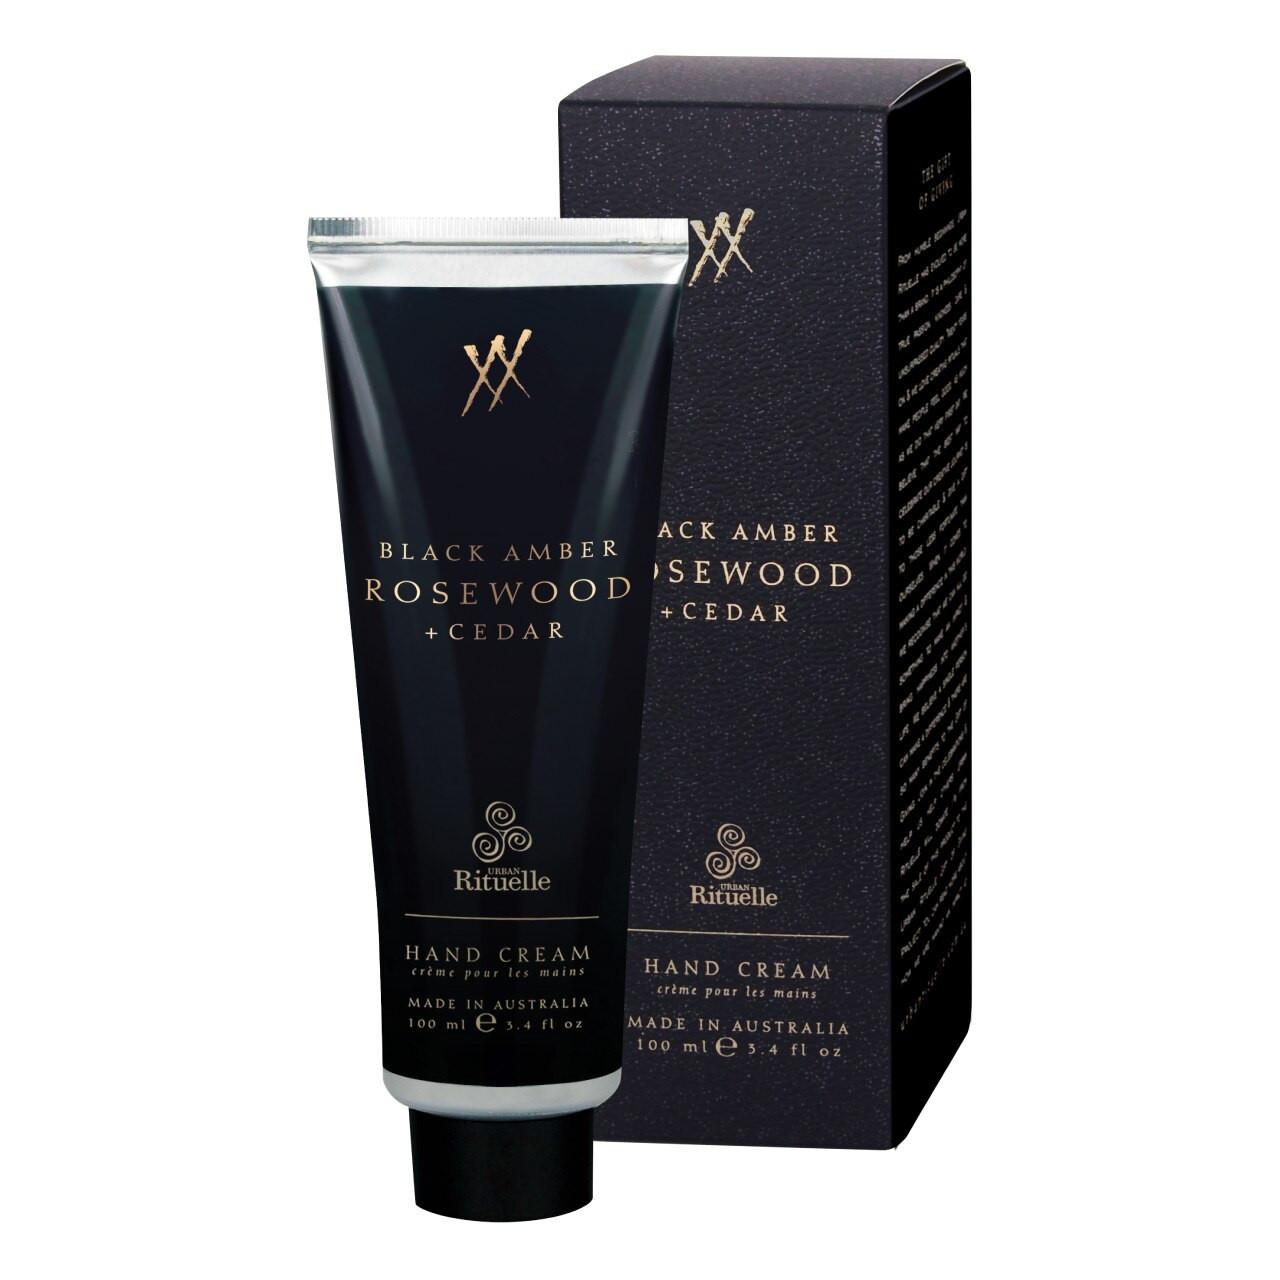 Alchemy - Black Amber, Rosewood & Cedar - Hand Cream - Urban Rituelle